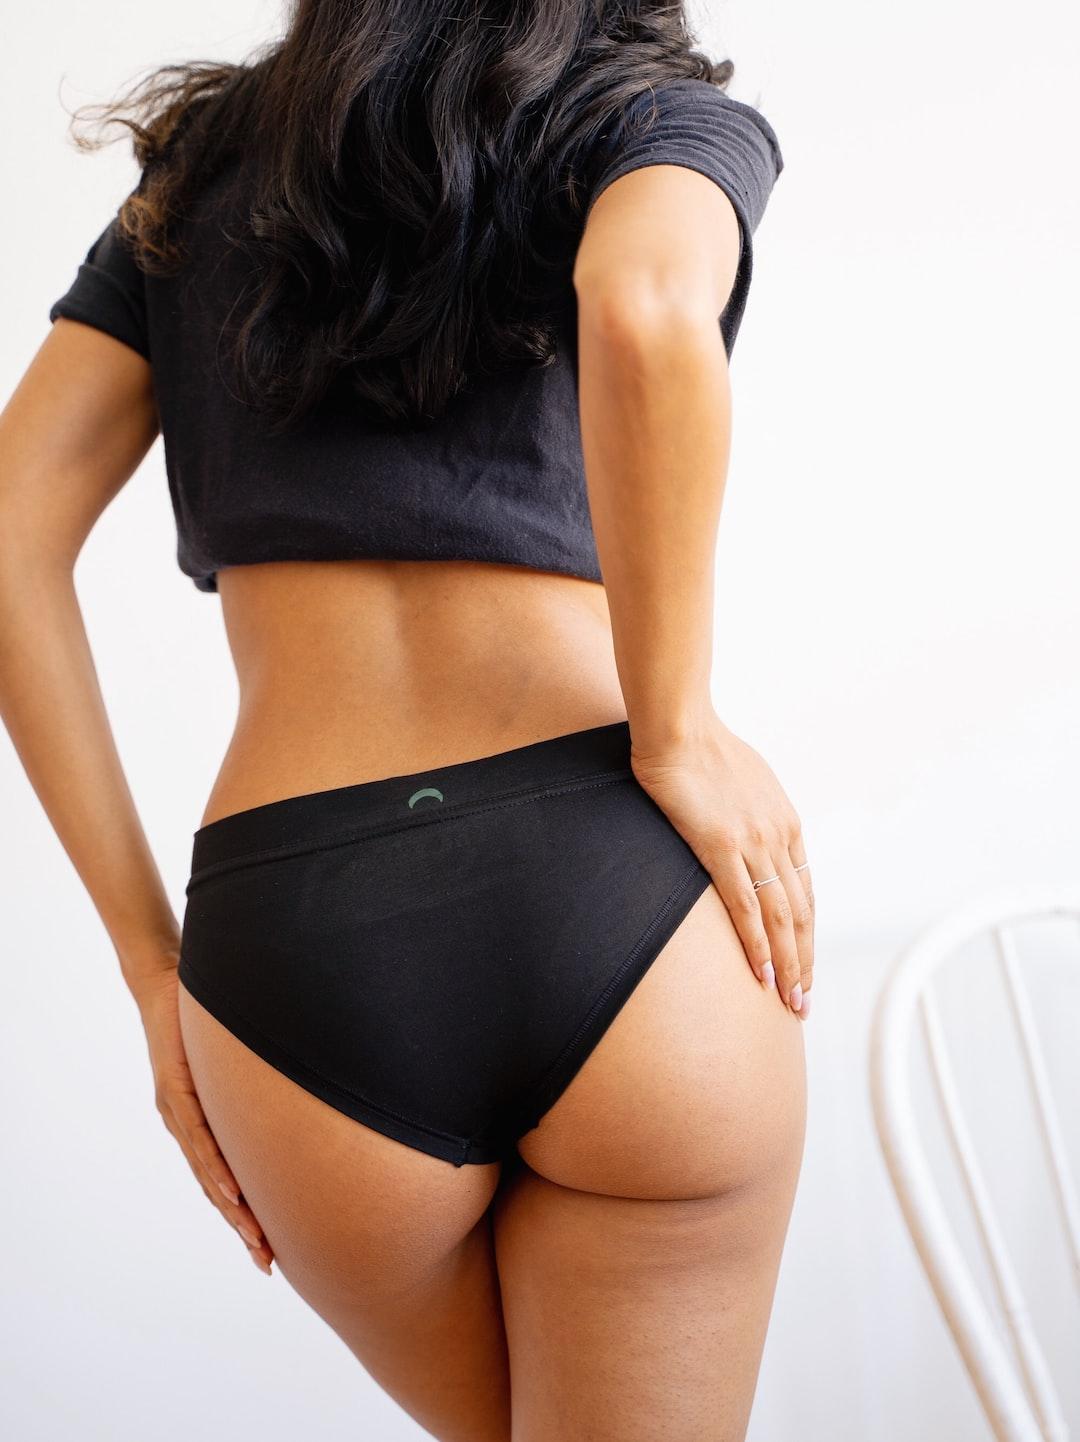 Womens Health | Woman in Her Underwear | Huha: Healthy Undies